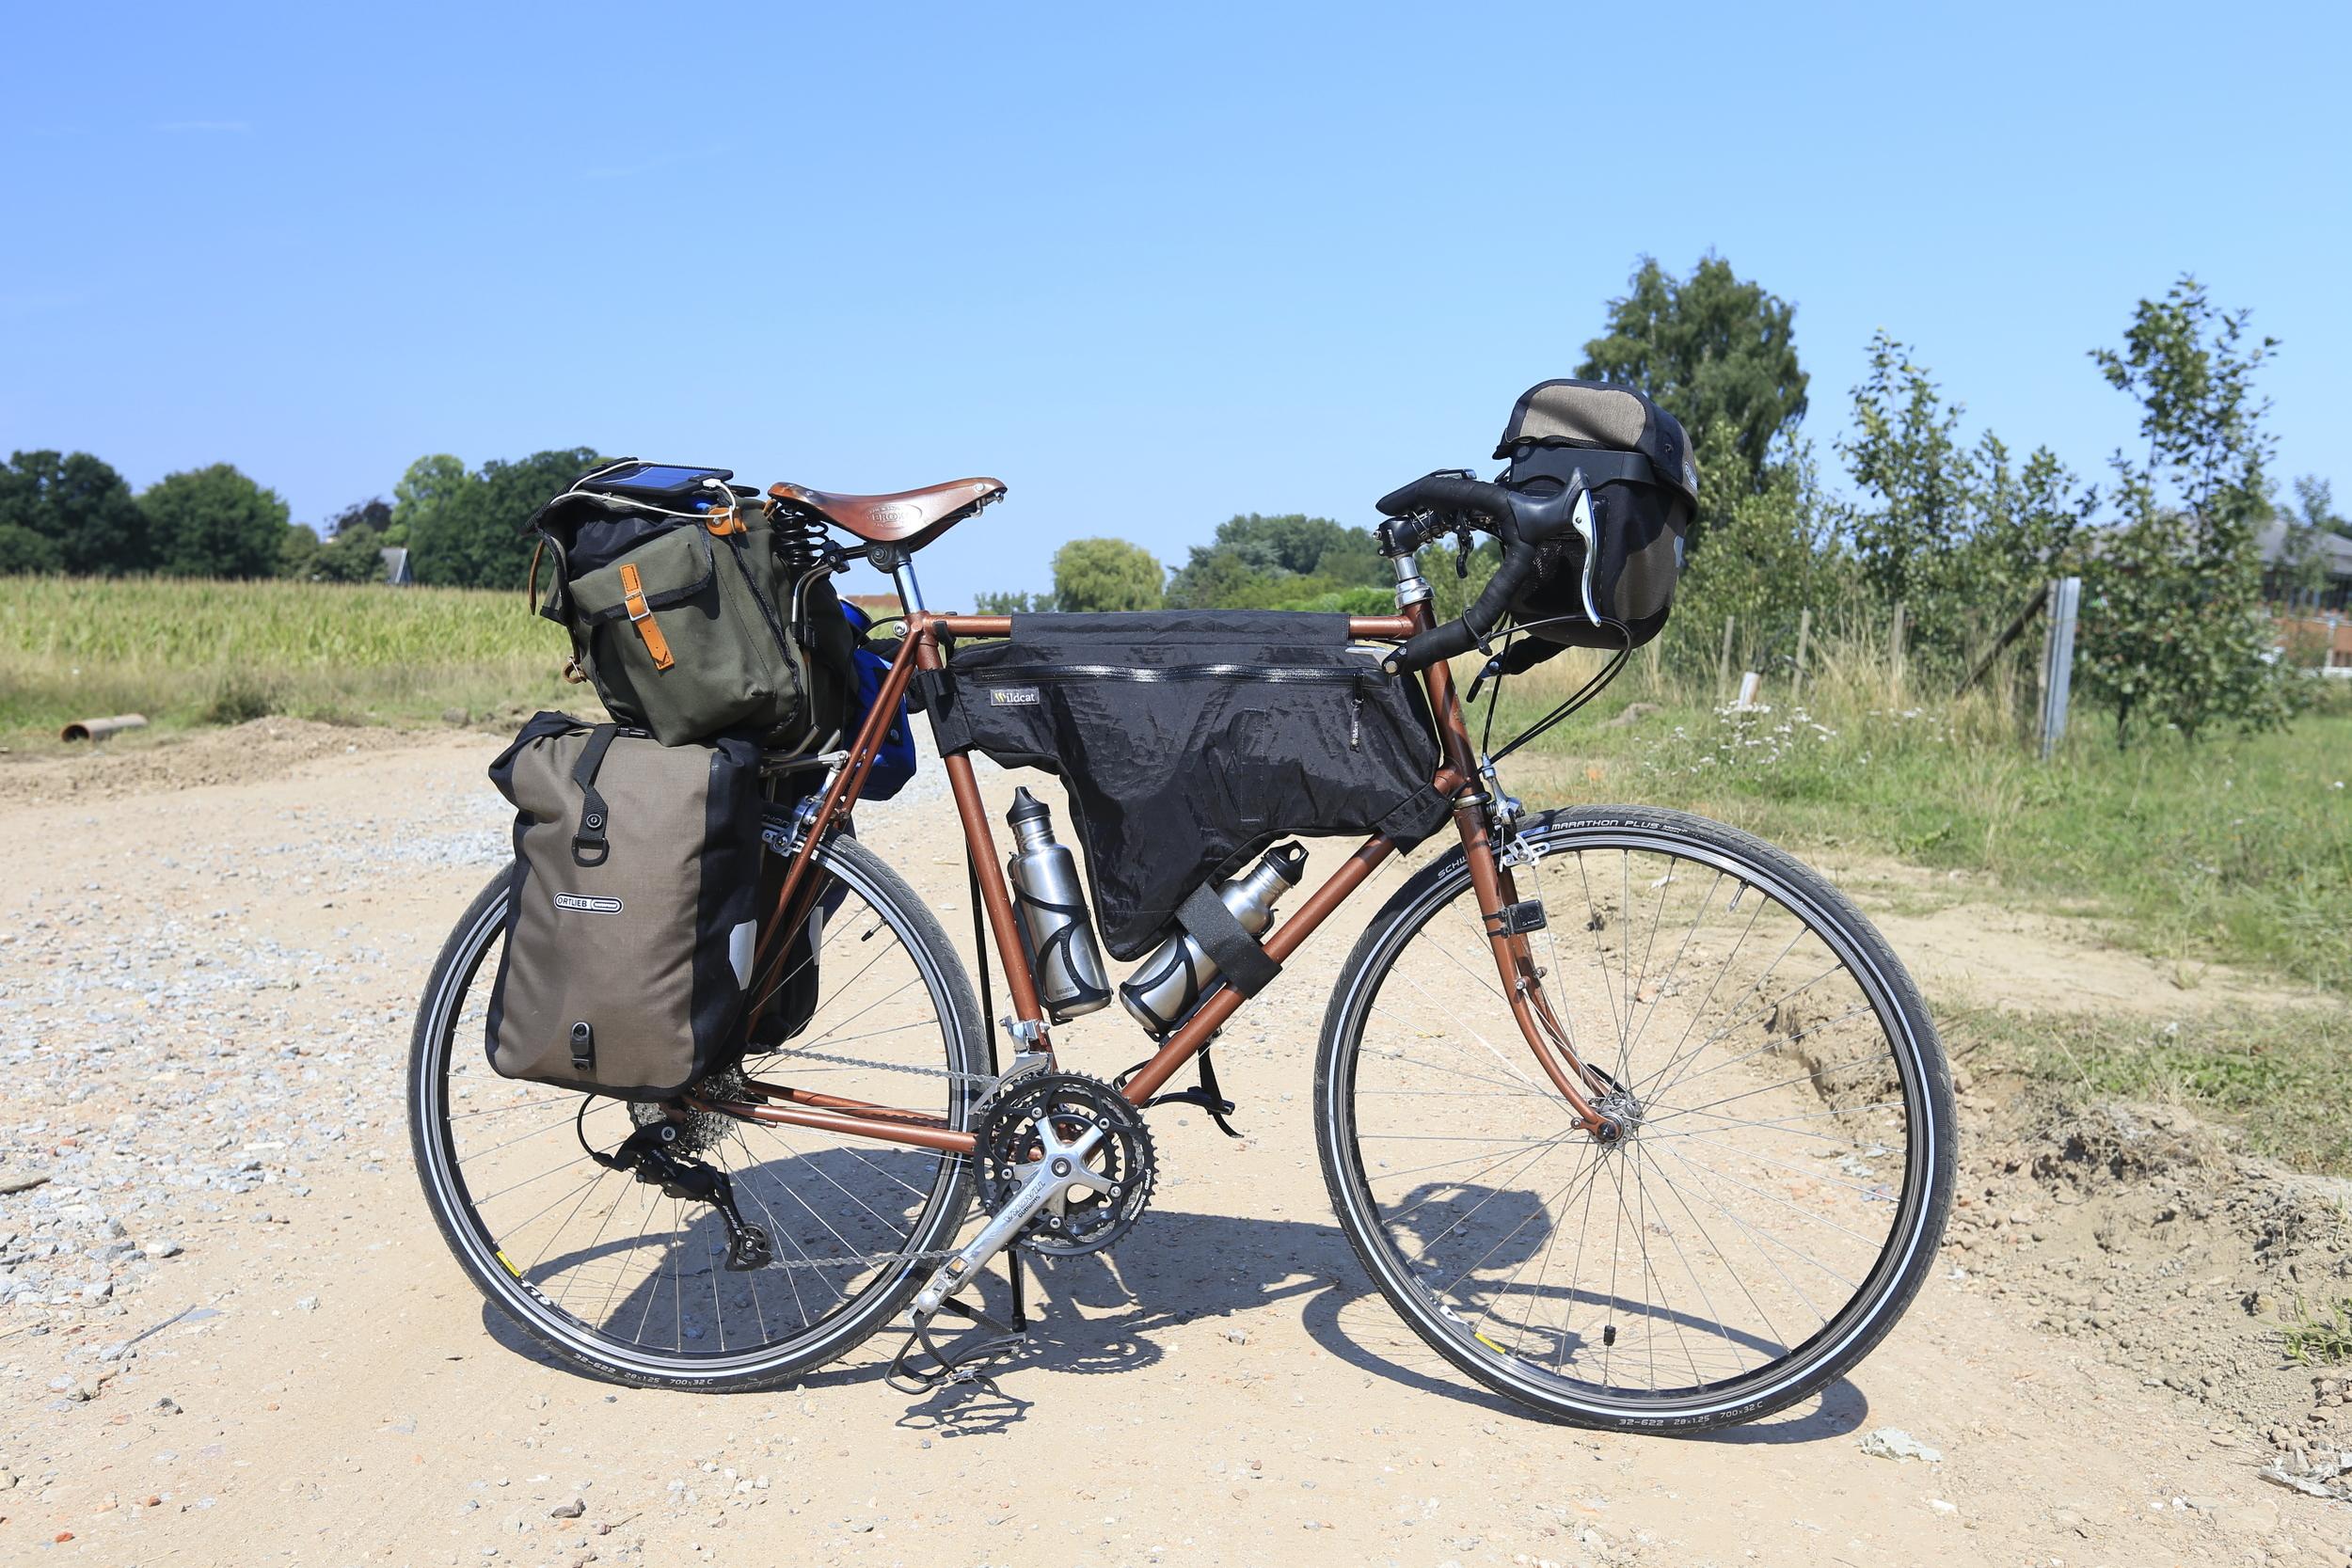 raleigh, raleigh touring bike, touring bike, bikepacking bike, bikepacking blog, cycle touring blog, bicycle touring blog, custom bicycle, custom tourer, photography blog